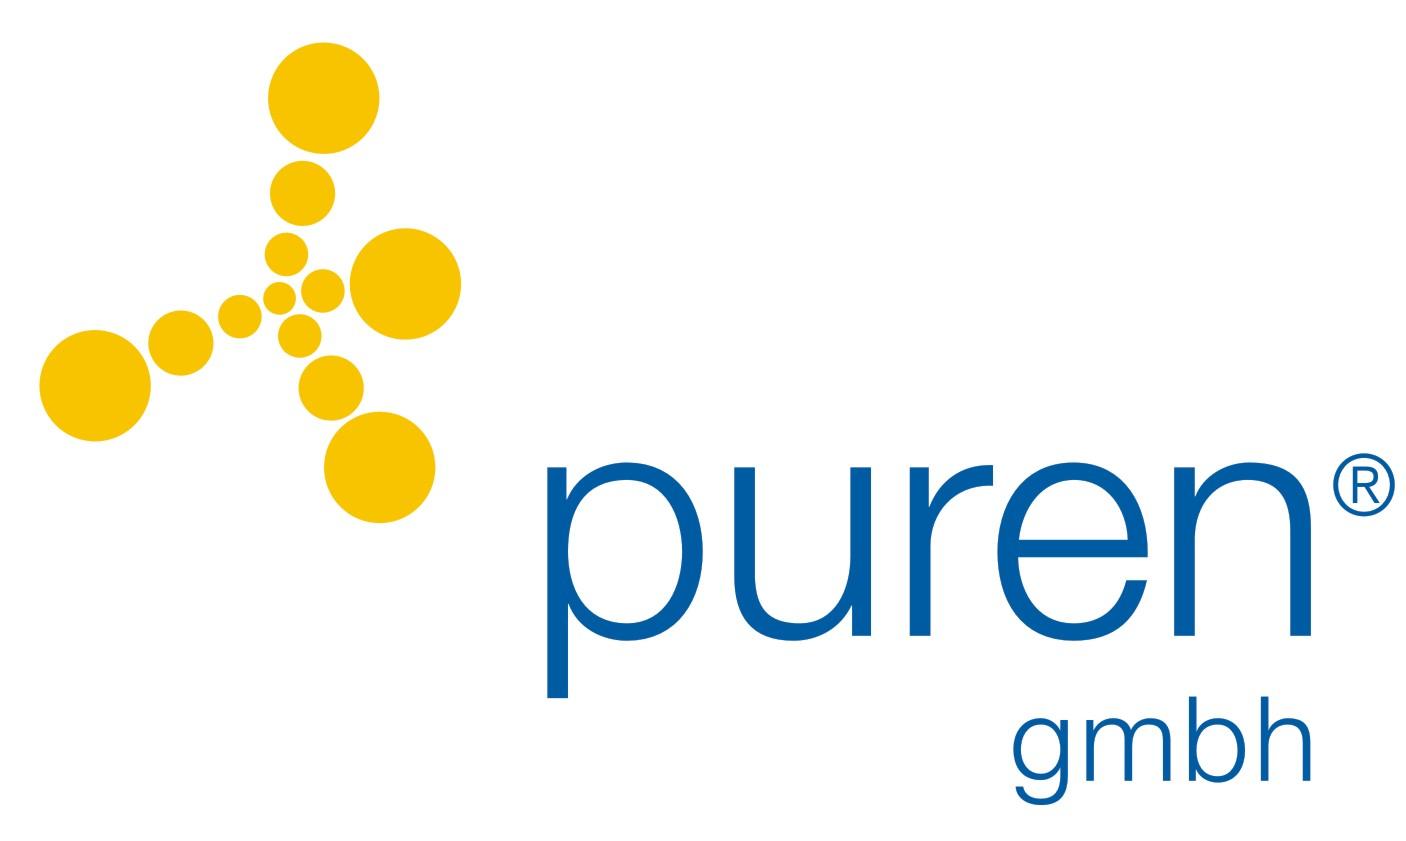 039_puren_GmbH_logo